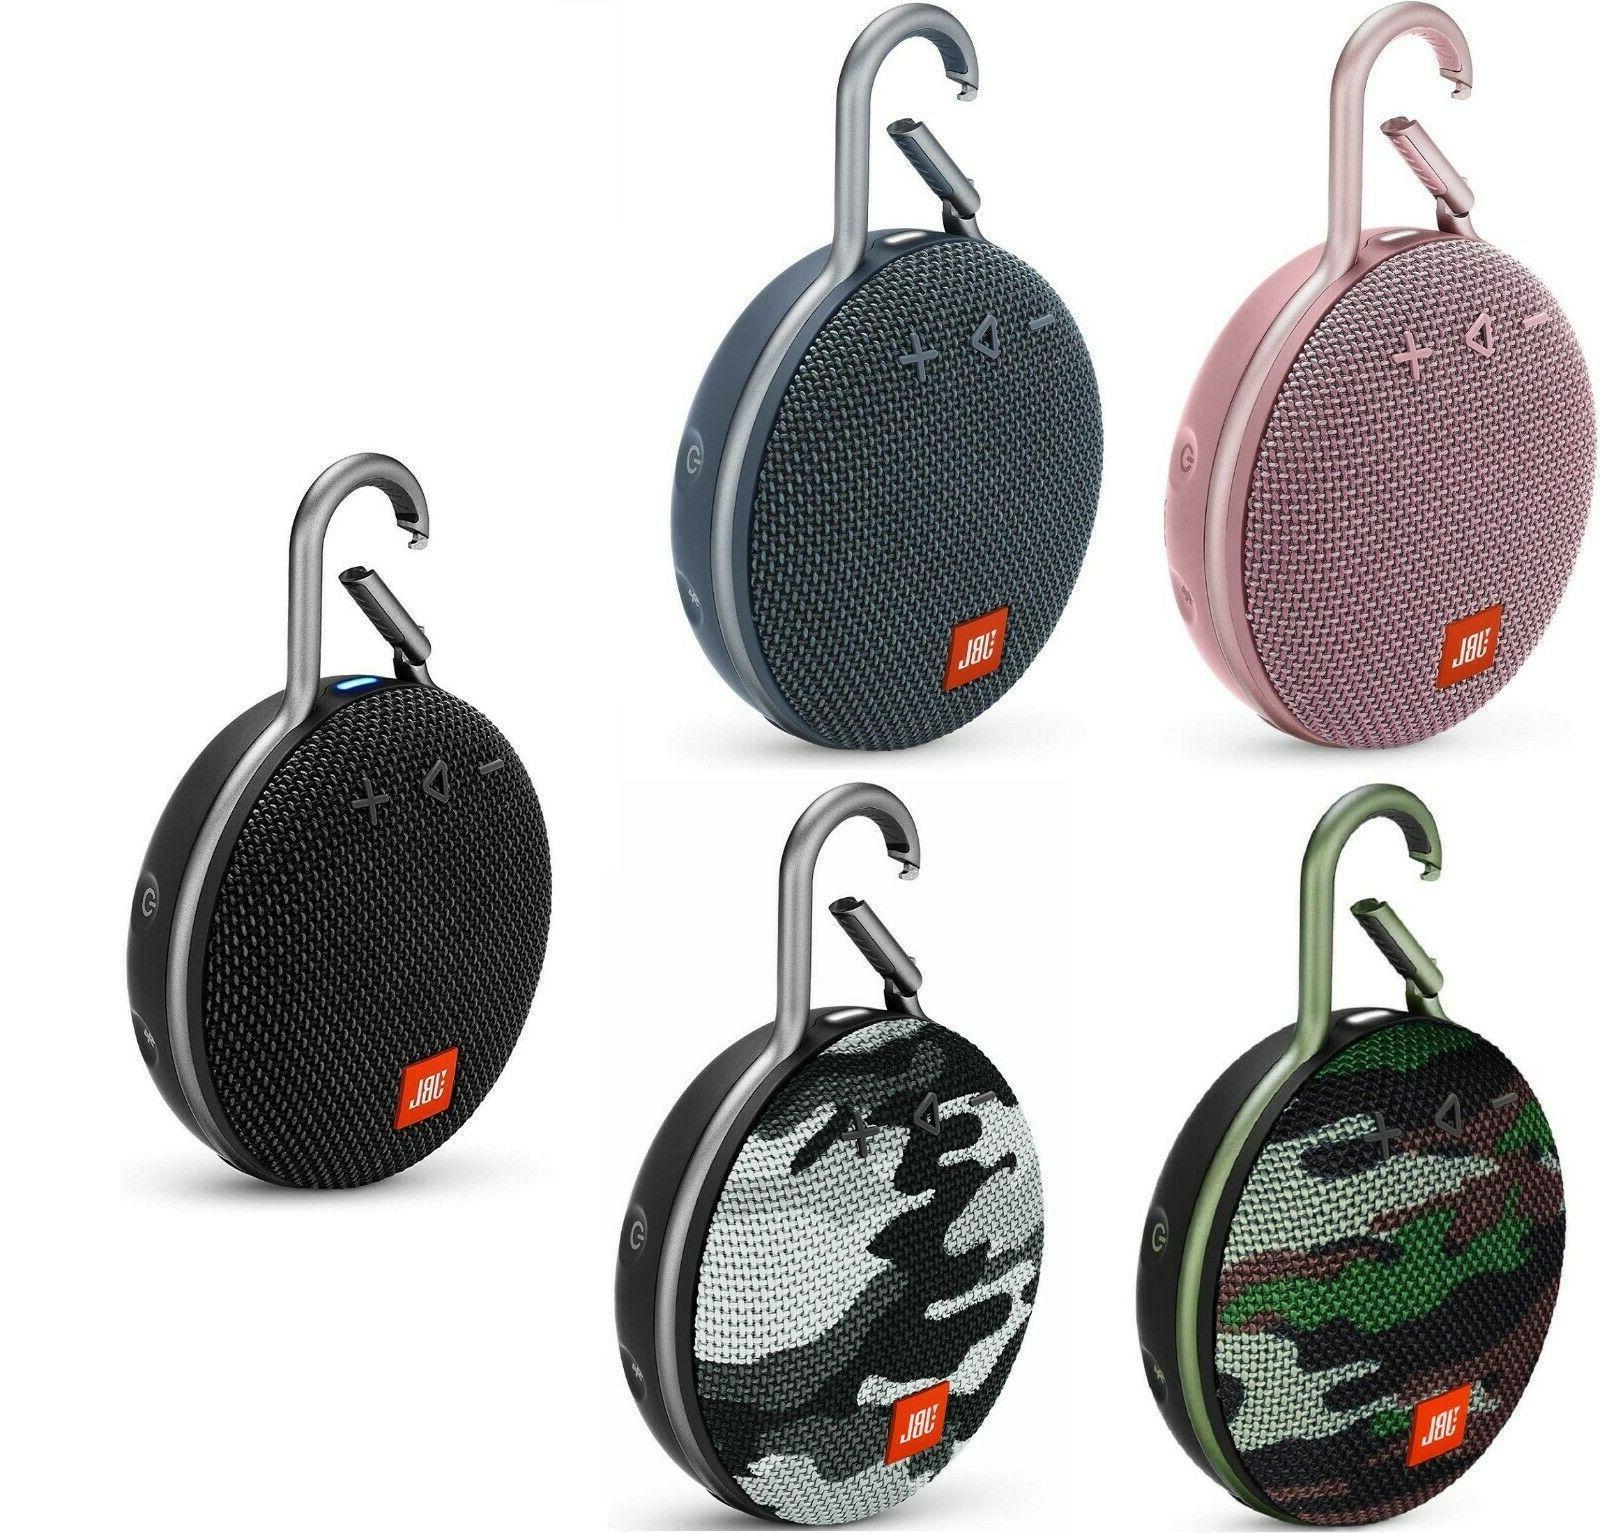 clip 3 bluetooth speaker rechargeable ipx7 waterproof